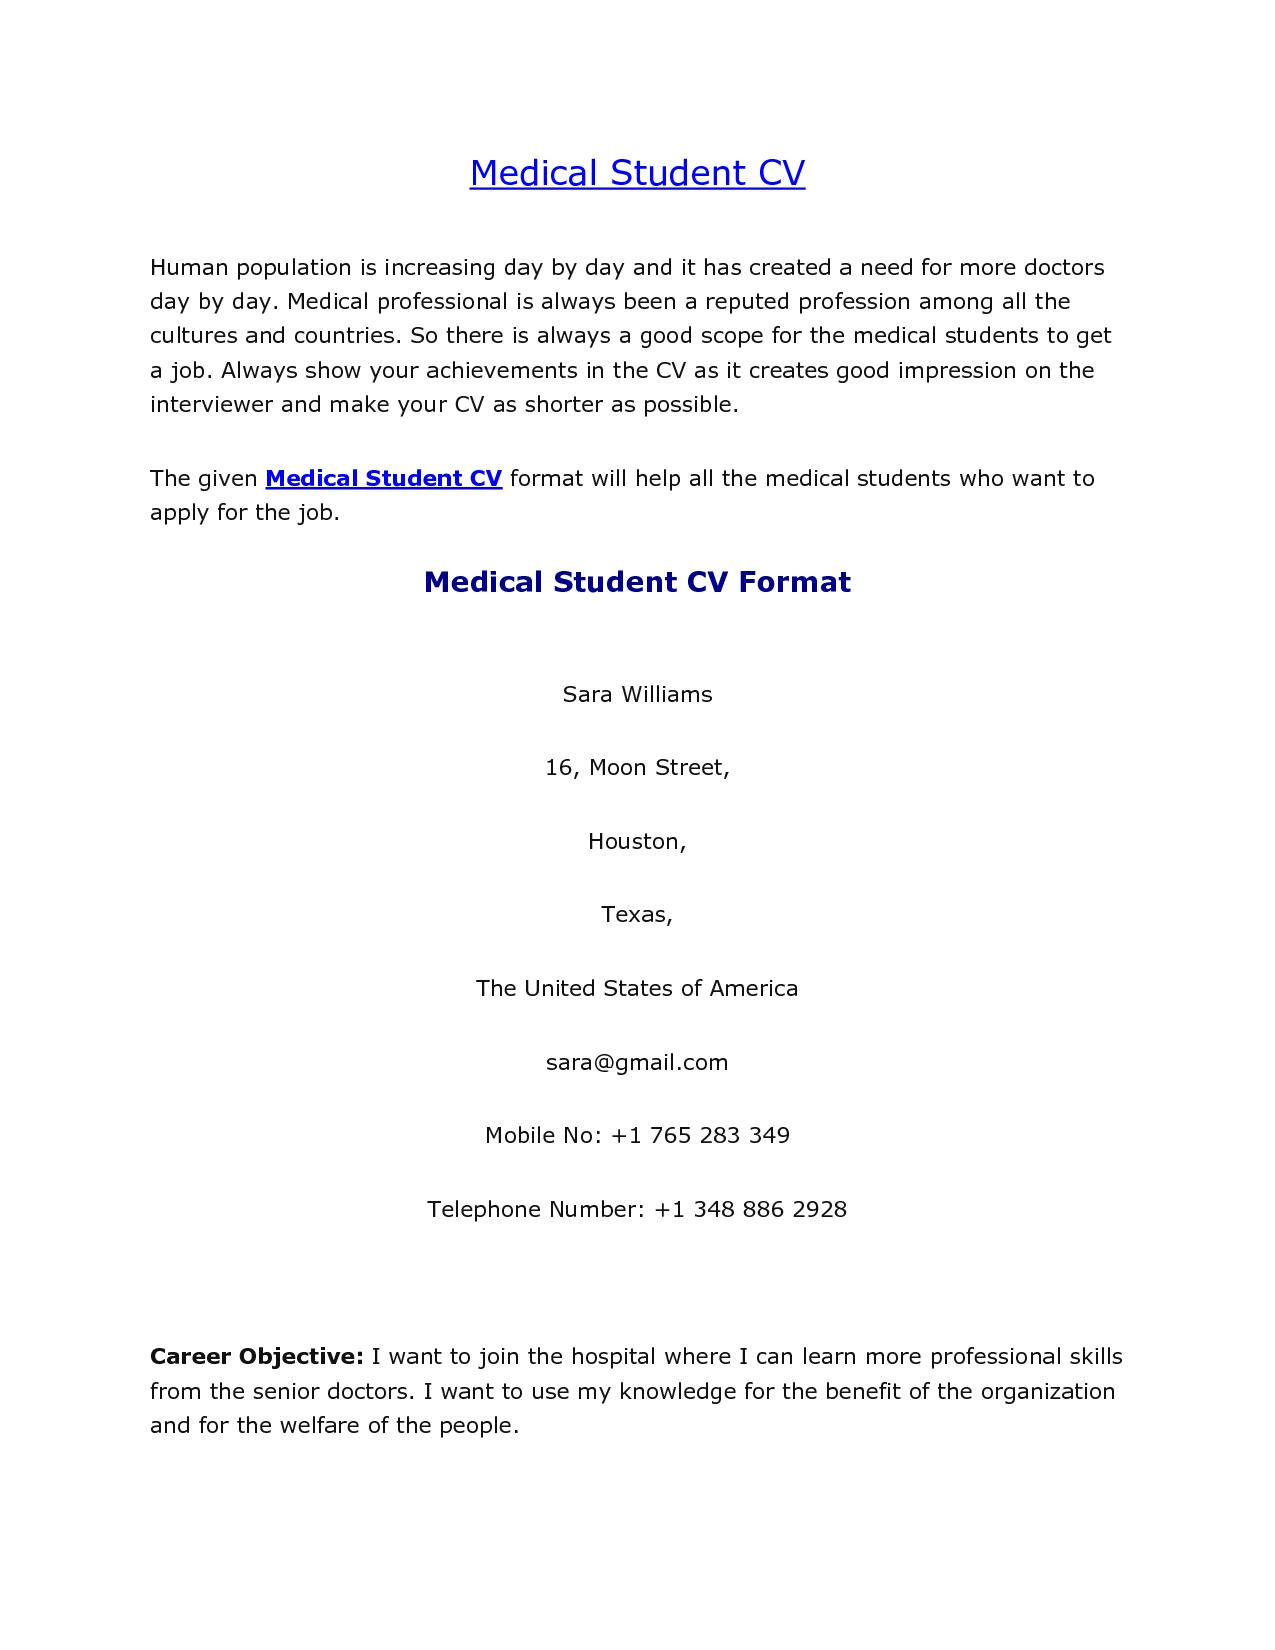 How to write an undergraduate cv